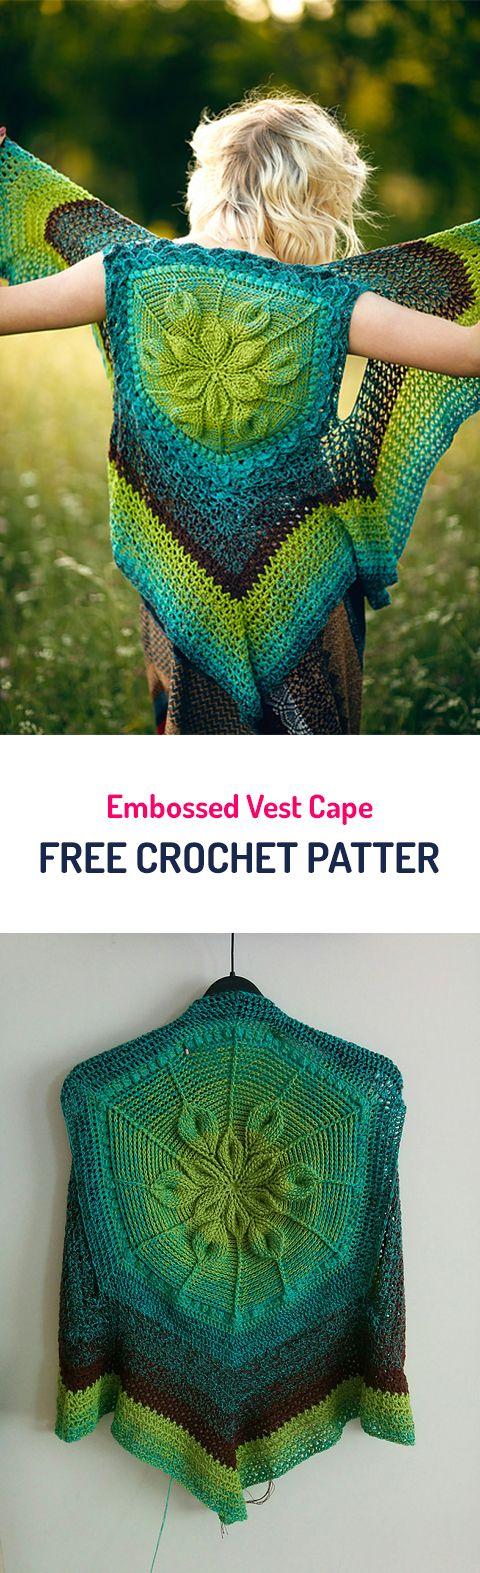 Embossed Vest Cape Free Crochet Pattern